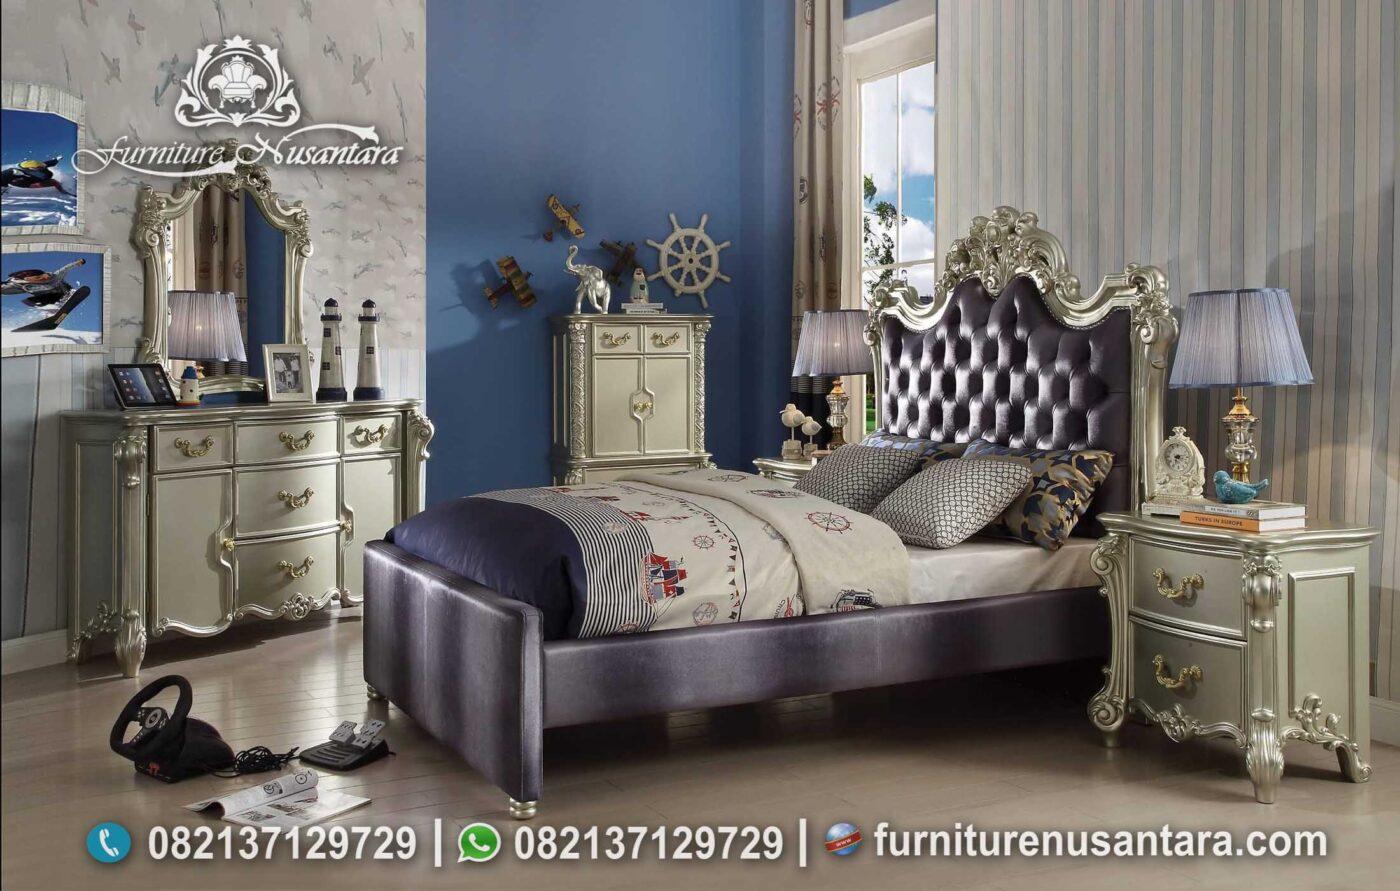 Jual Kamar Set Cantik Feminim KS-131, Furniture Nusantara